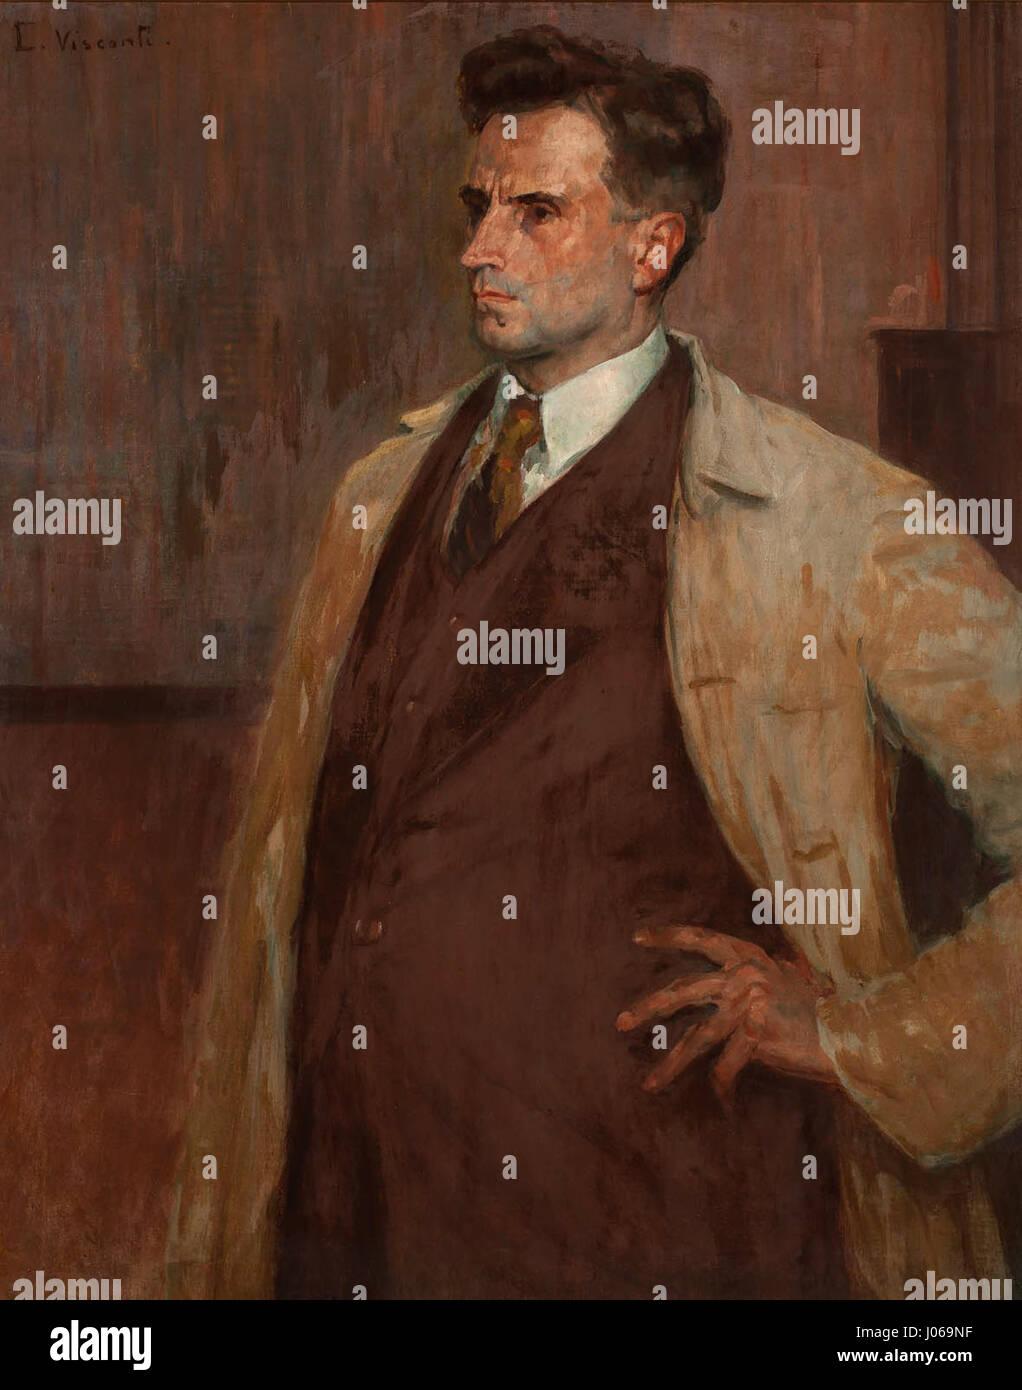 Eliseu Visconti - Retrato do escultor João Zacco Paraná - Stock Image